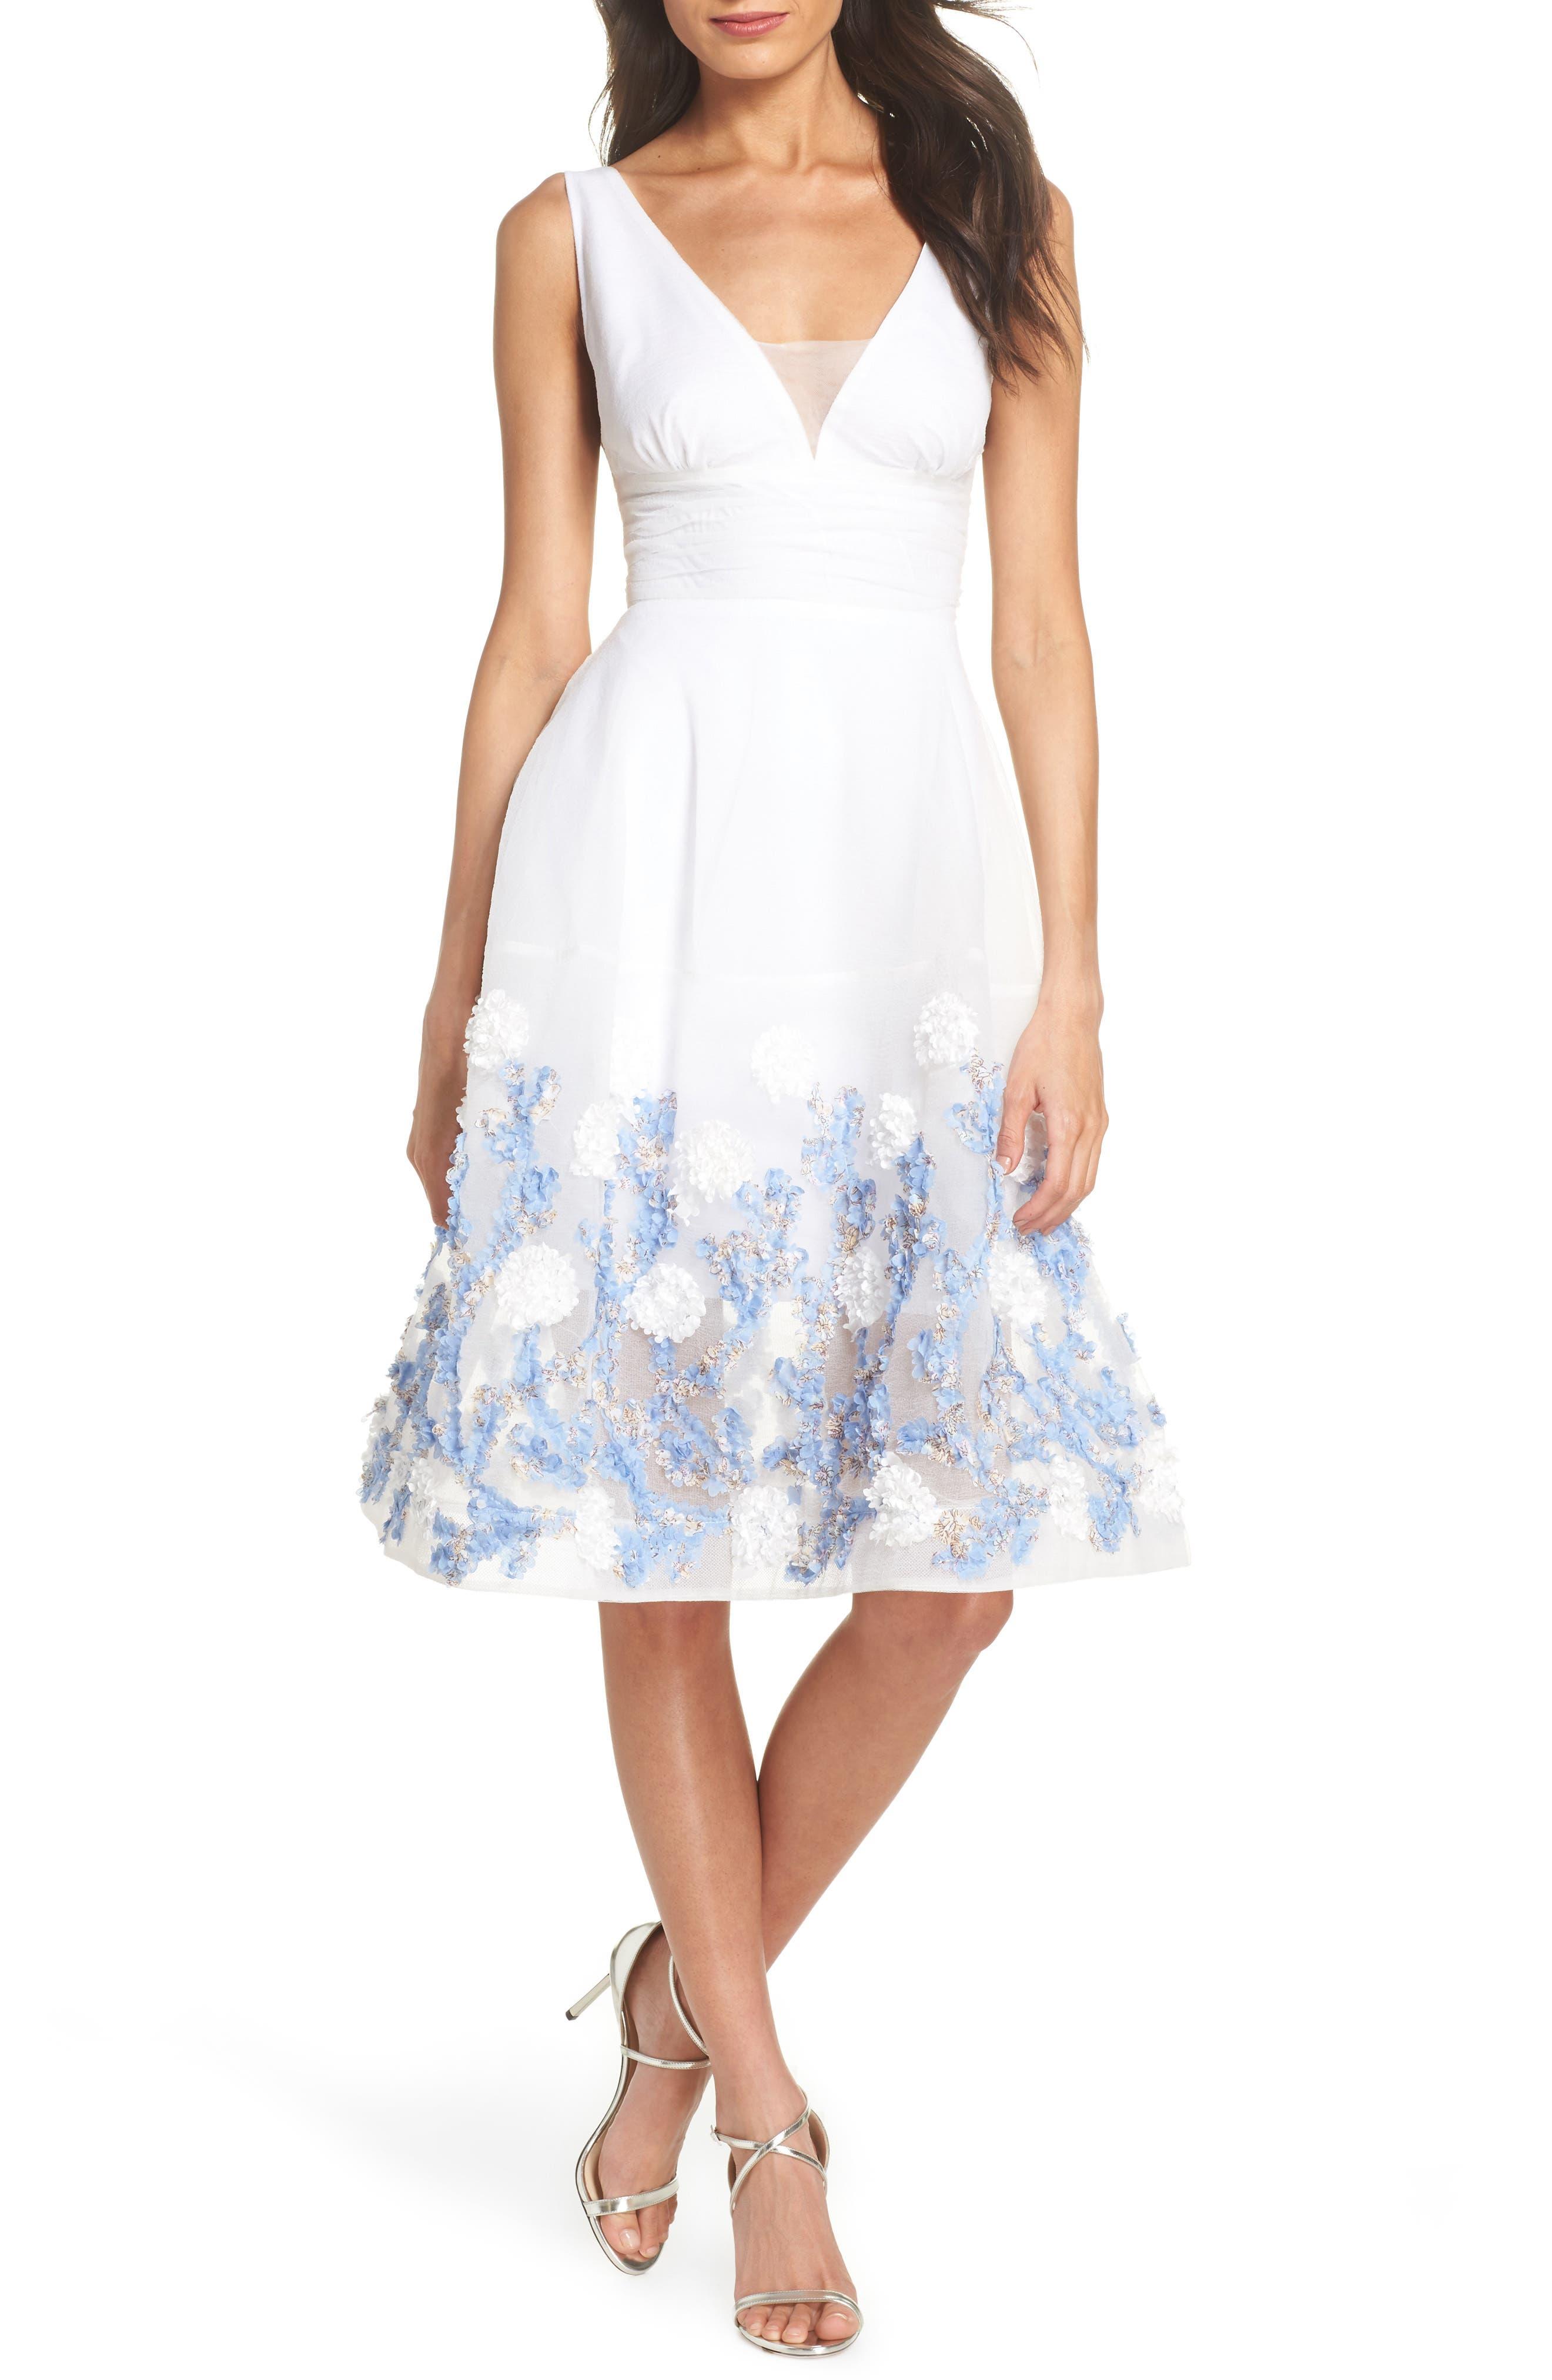 Malvina Embroidered Hem Fit & Flare Dress,                             Main thumbnail 1, color,                             White/ Blue